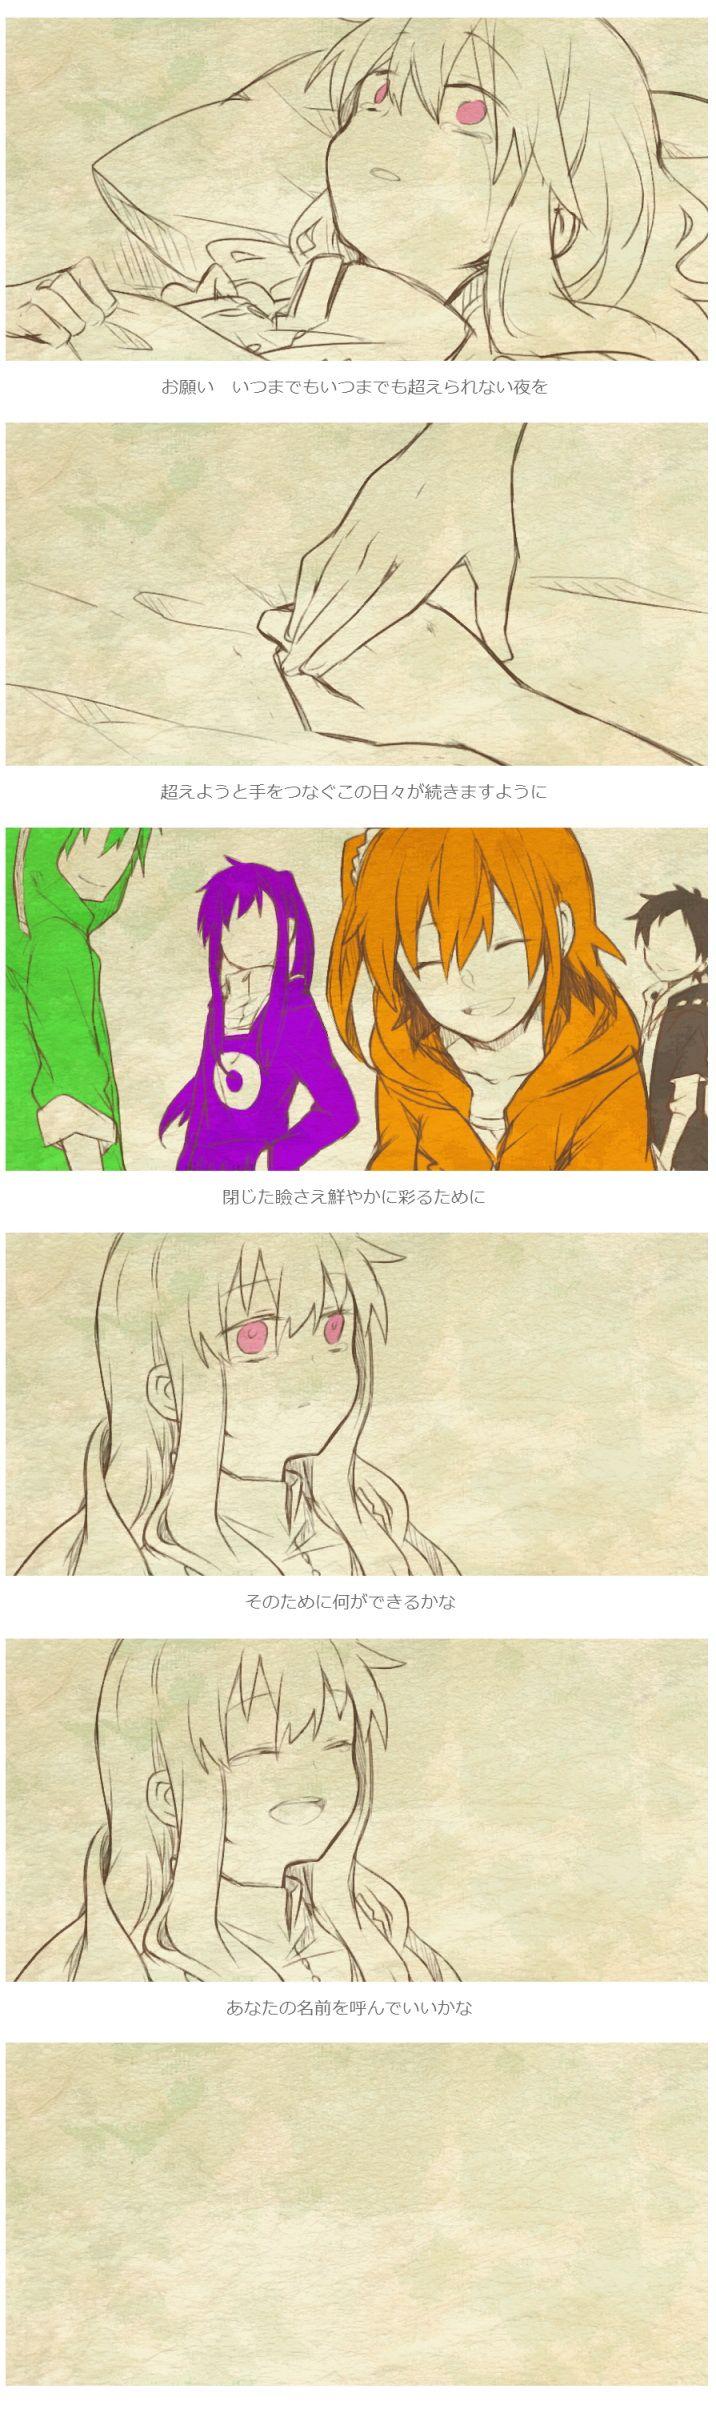 *Mihaya, Kagerou Project, Seto Kousuke, Kano Shuuya, Kisaragi Momo, Kozakura Marry